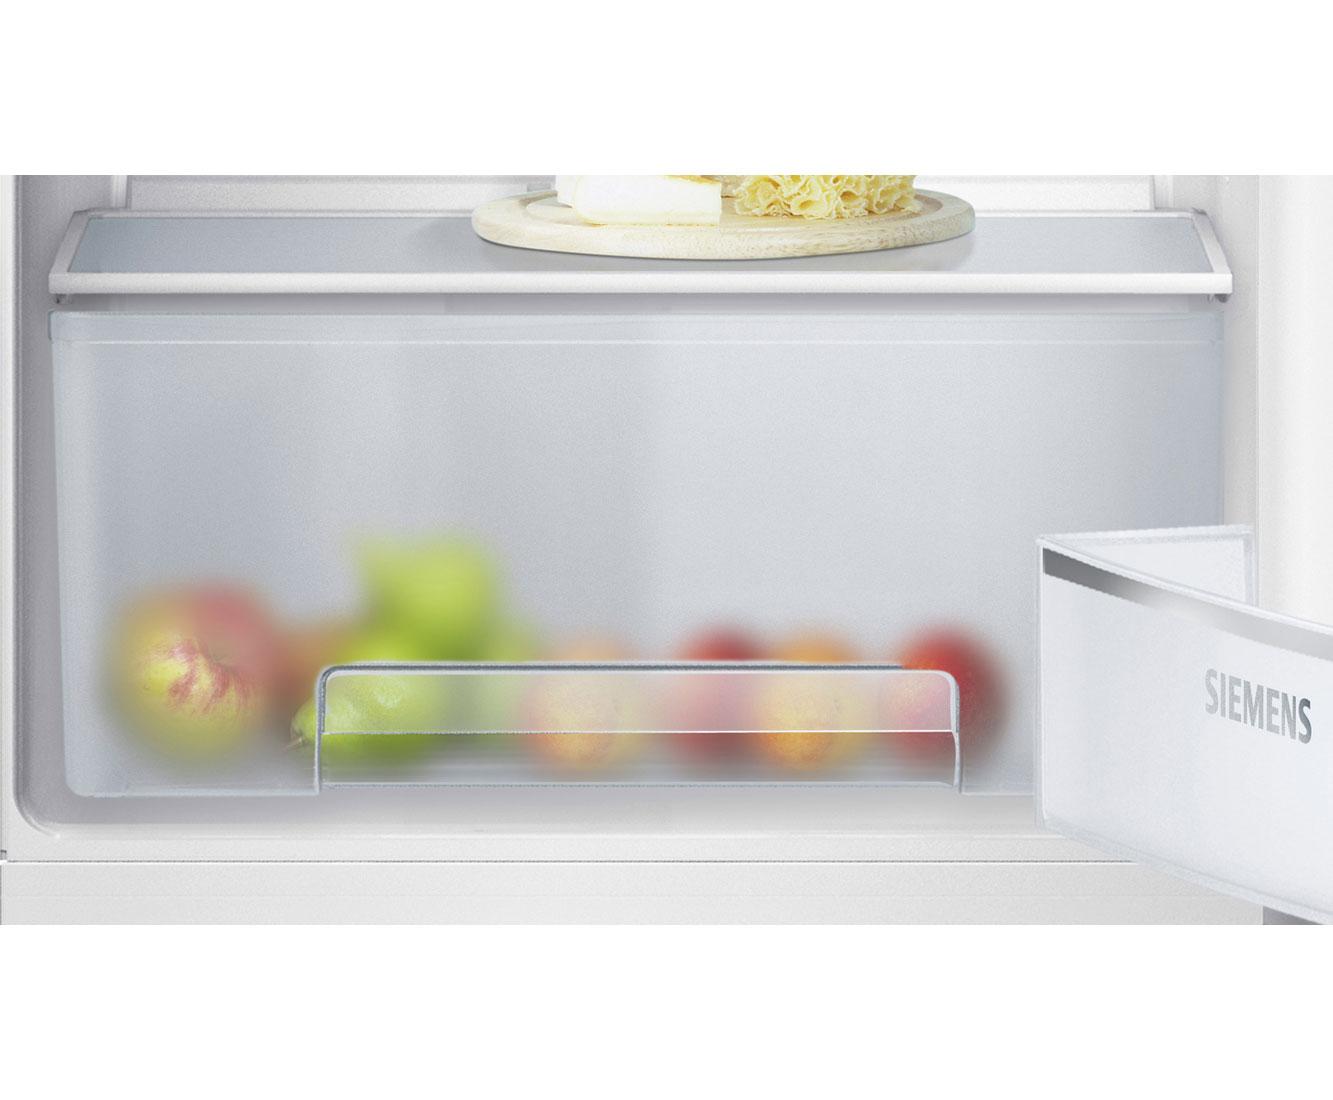 Kühlschrank Siemens : Siemens ki lv kühlschrank iq eingebaut cm weiß neu ebay